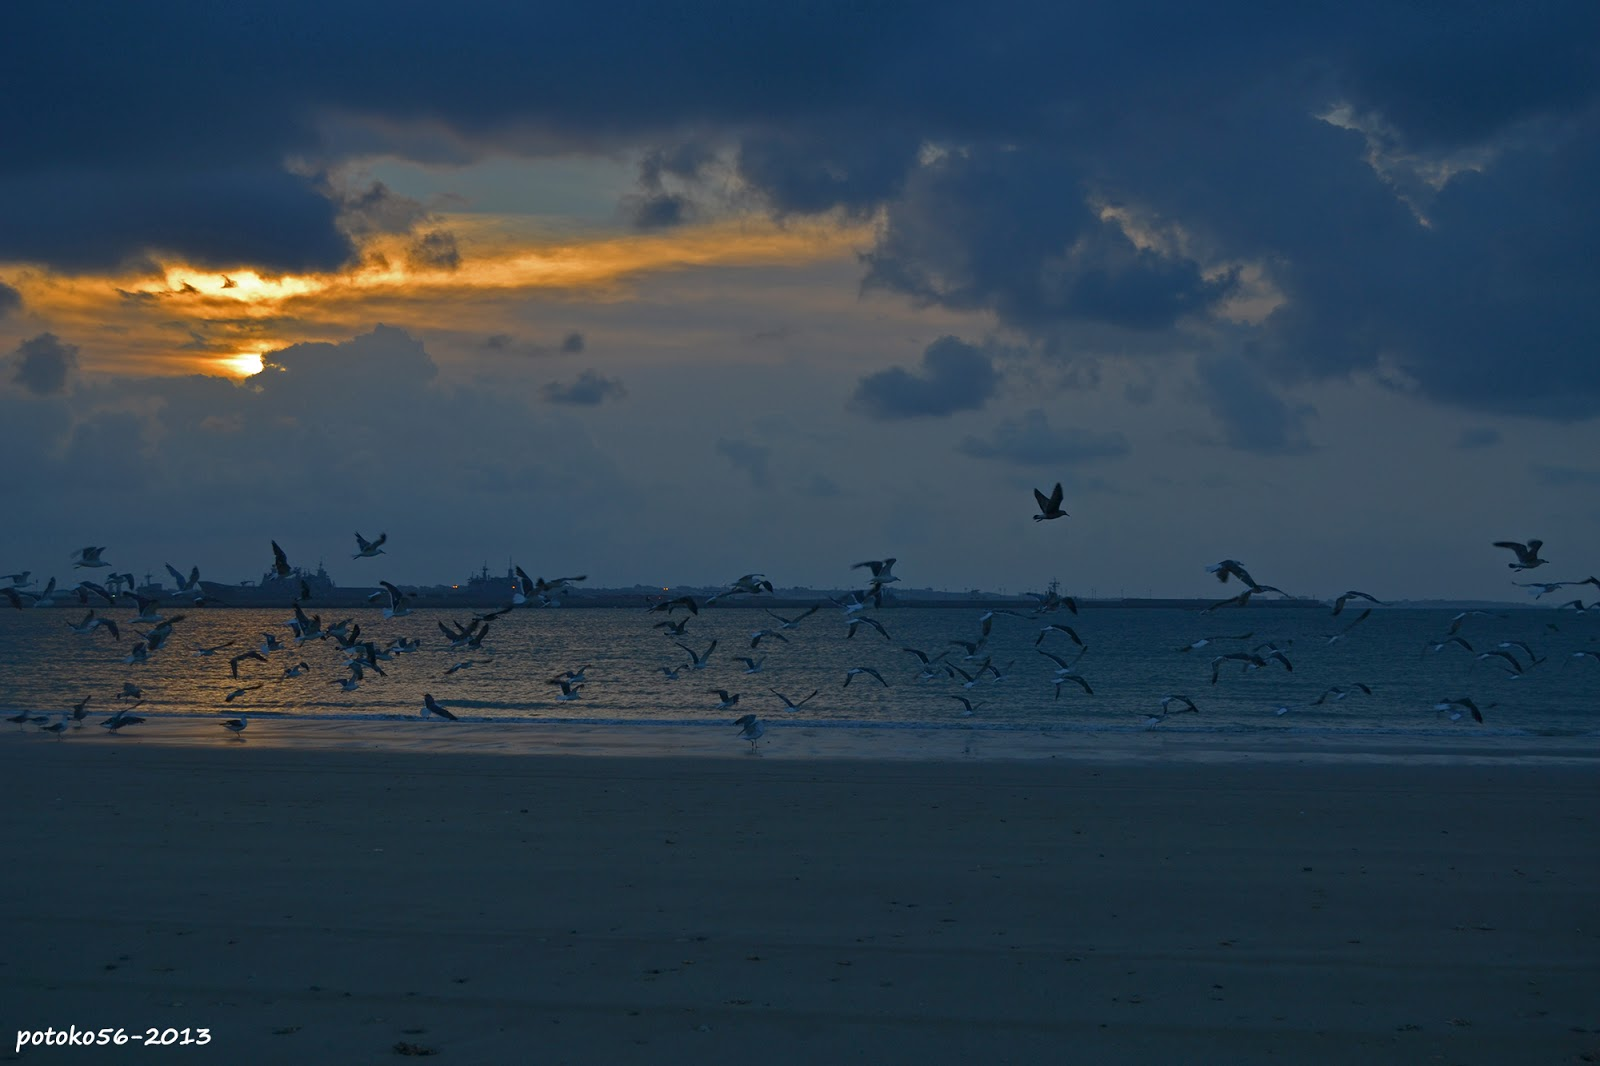 Playa del Chorrillo gaviotas volando sobre la orilla Rota